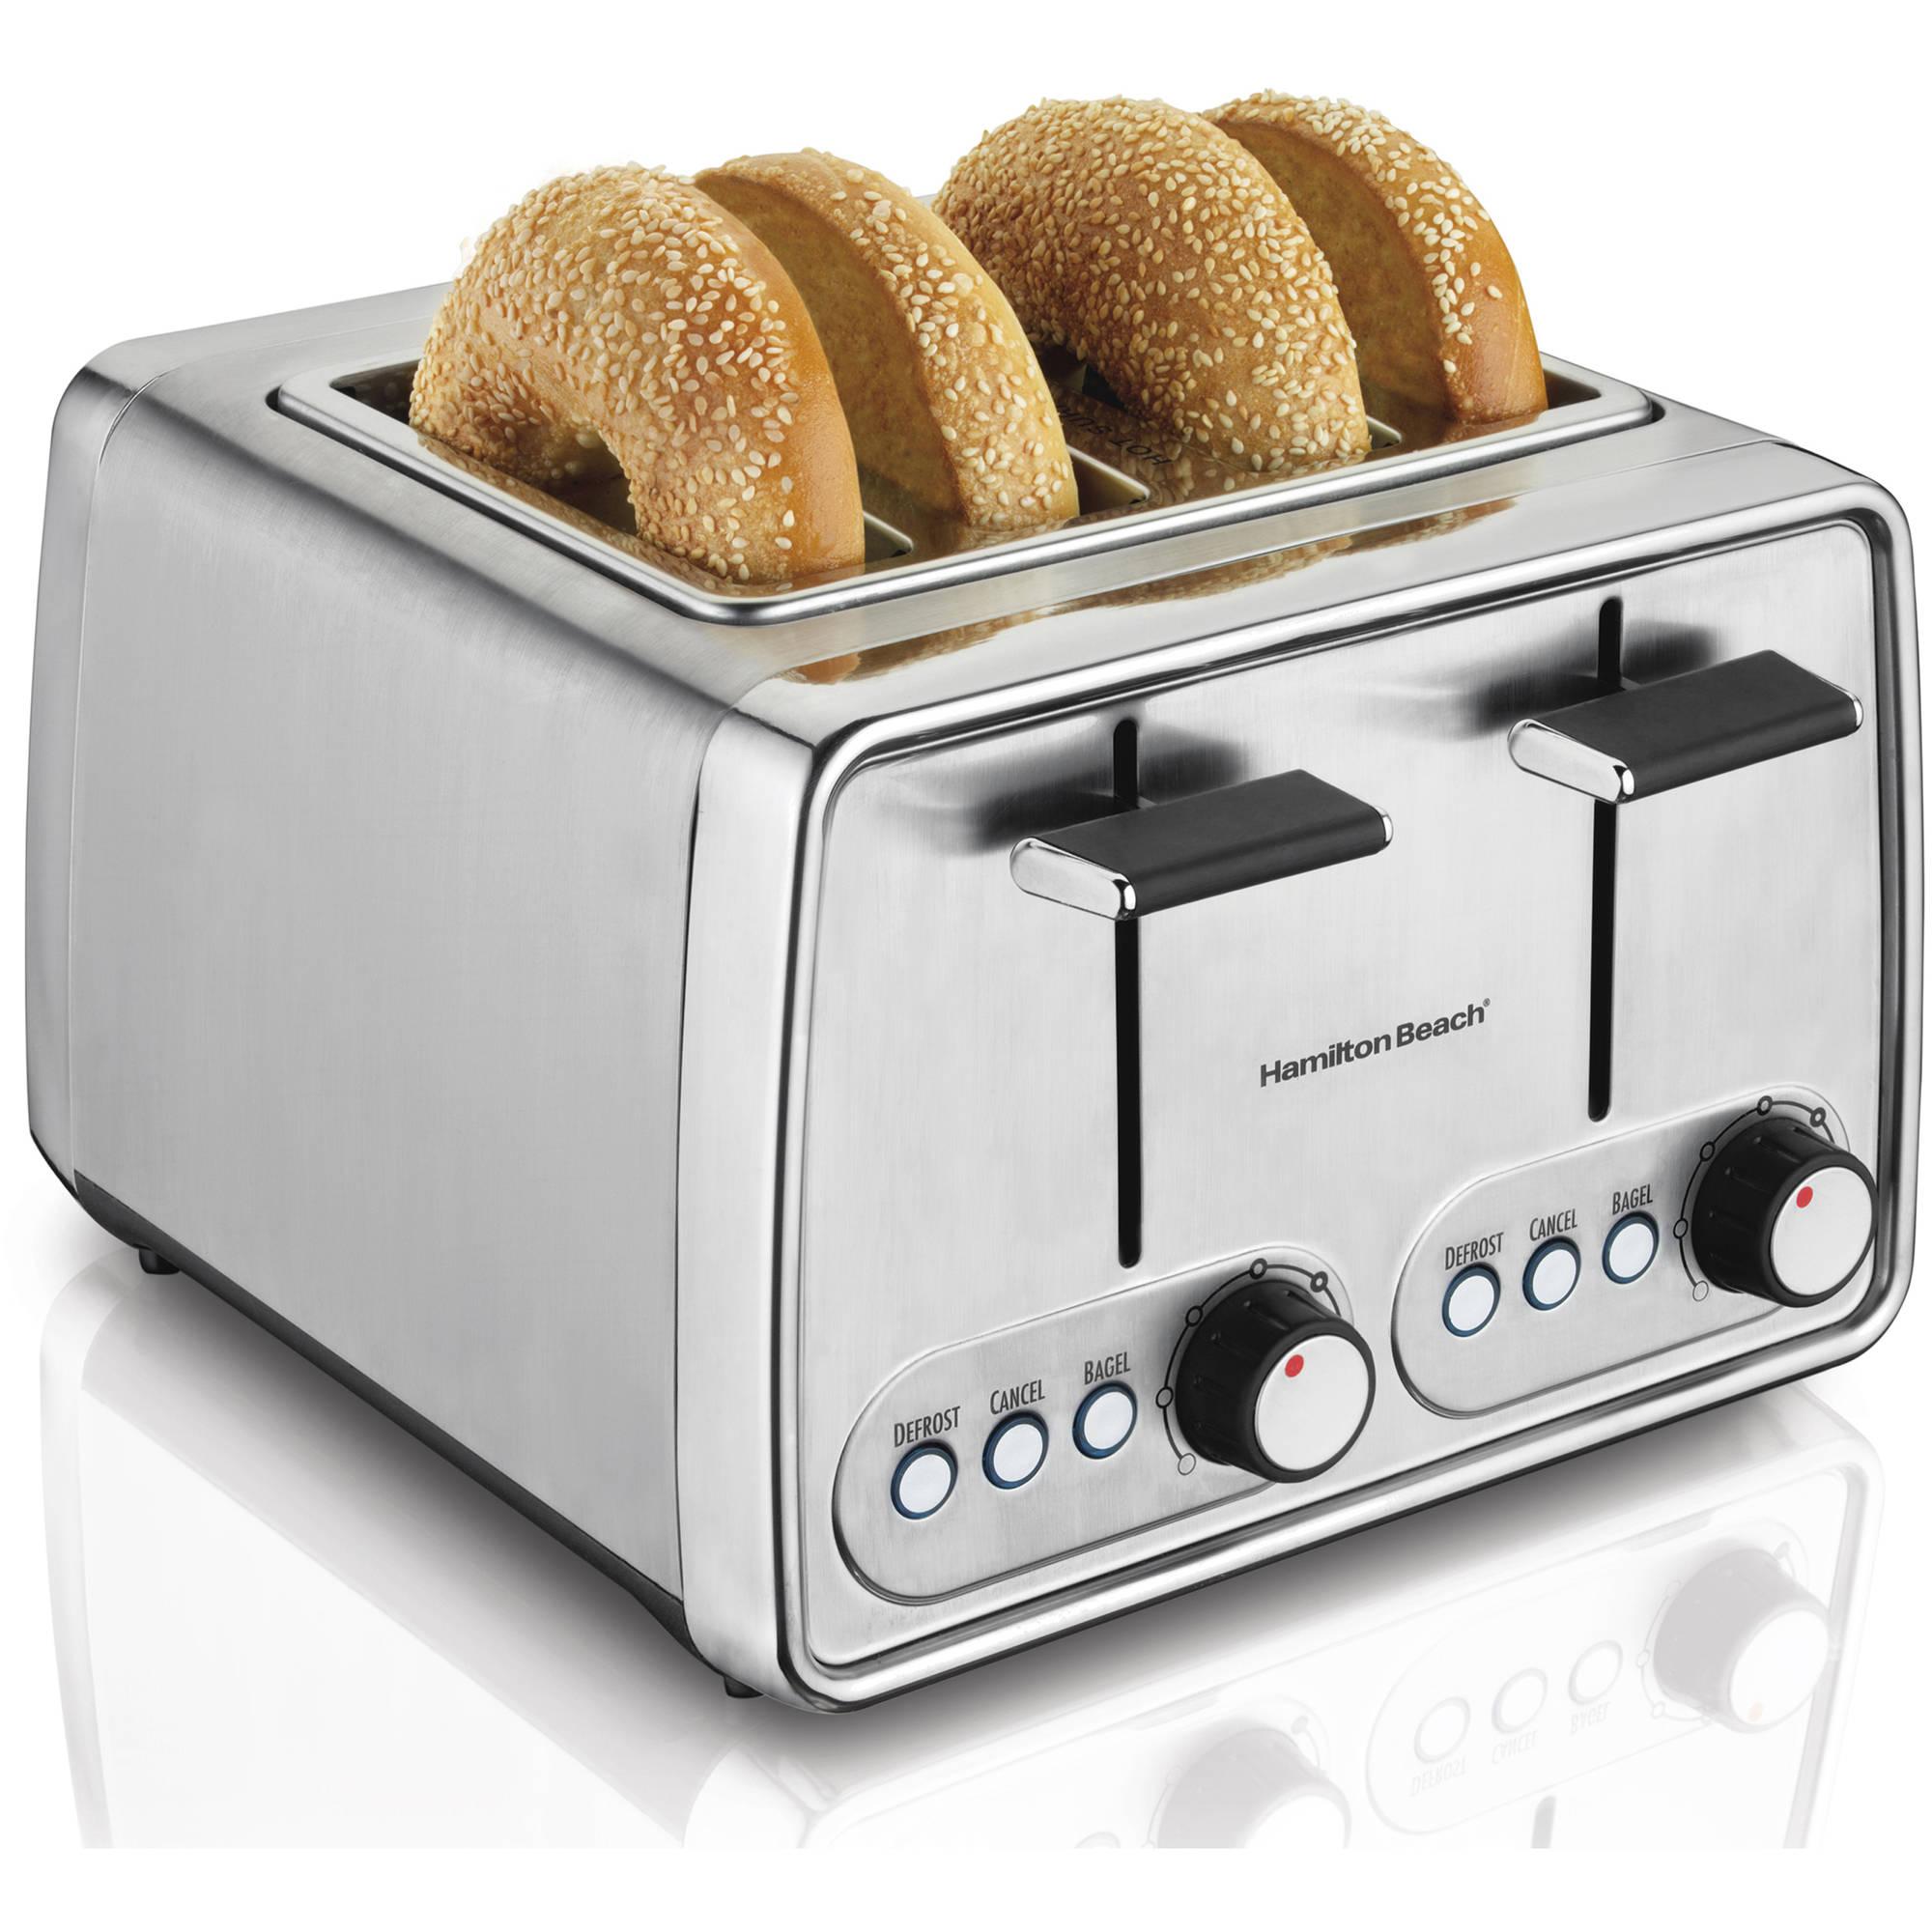 Refurbished Hamilton Beach 4 Slice Modern Toaster | Model# R24781